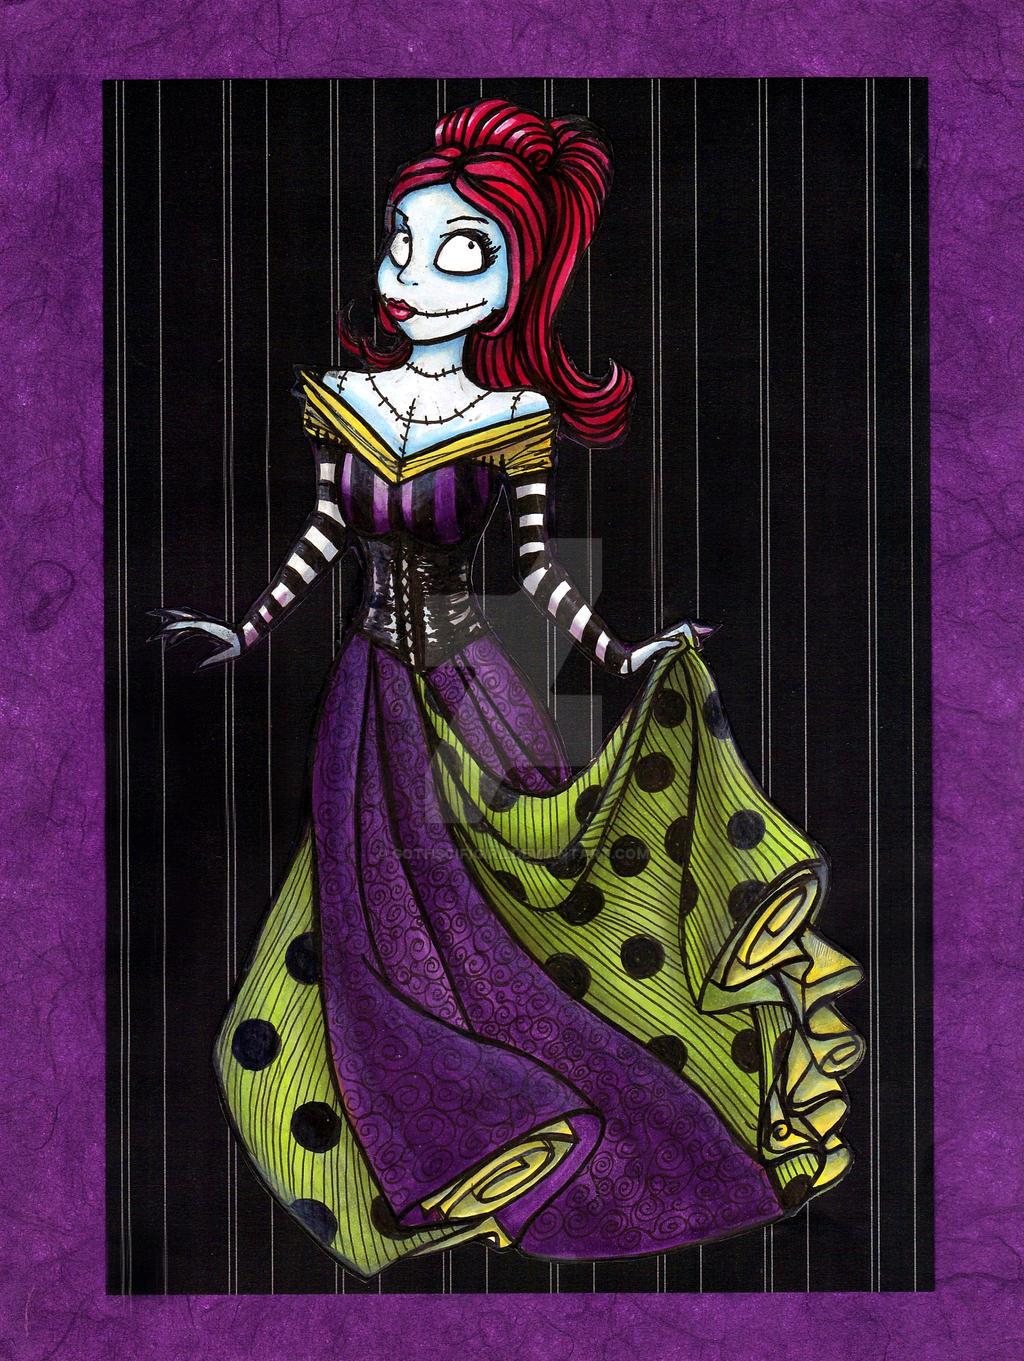 Sally, Disney Princess of Halloweeentown by Gothscifigirl